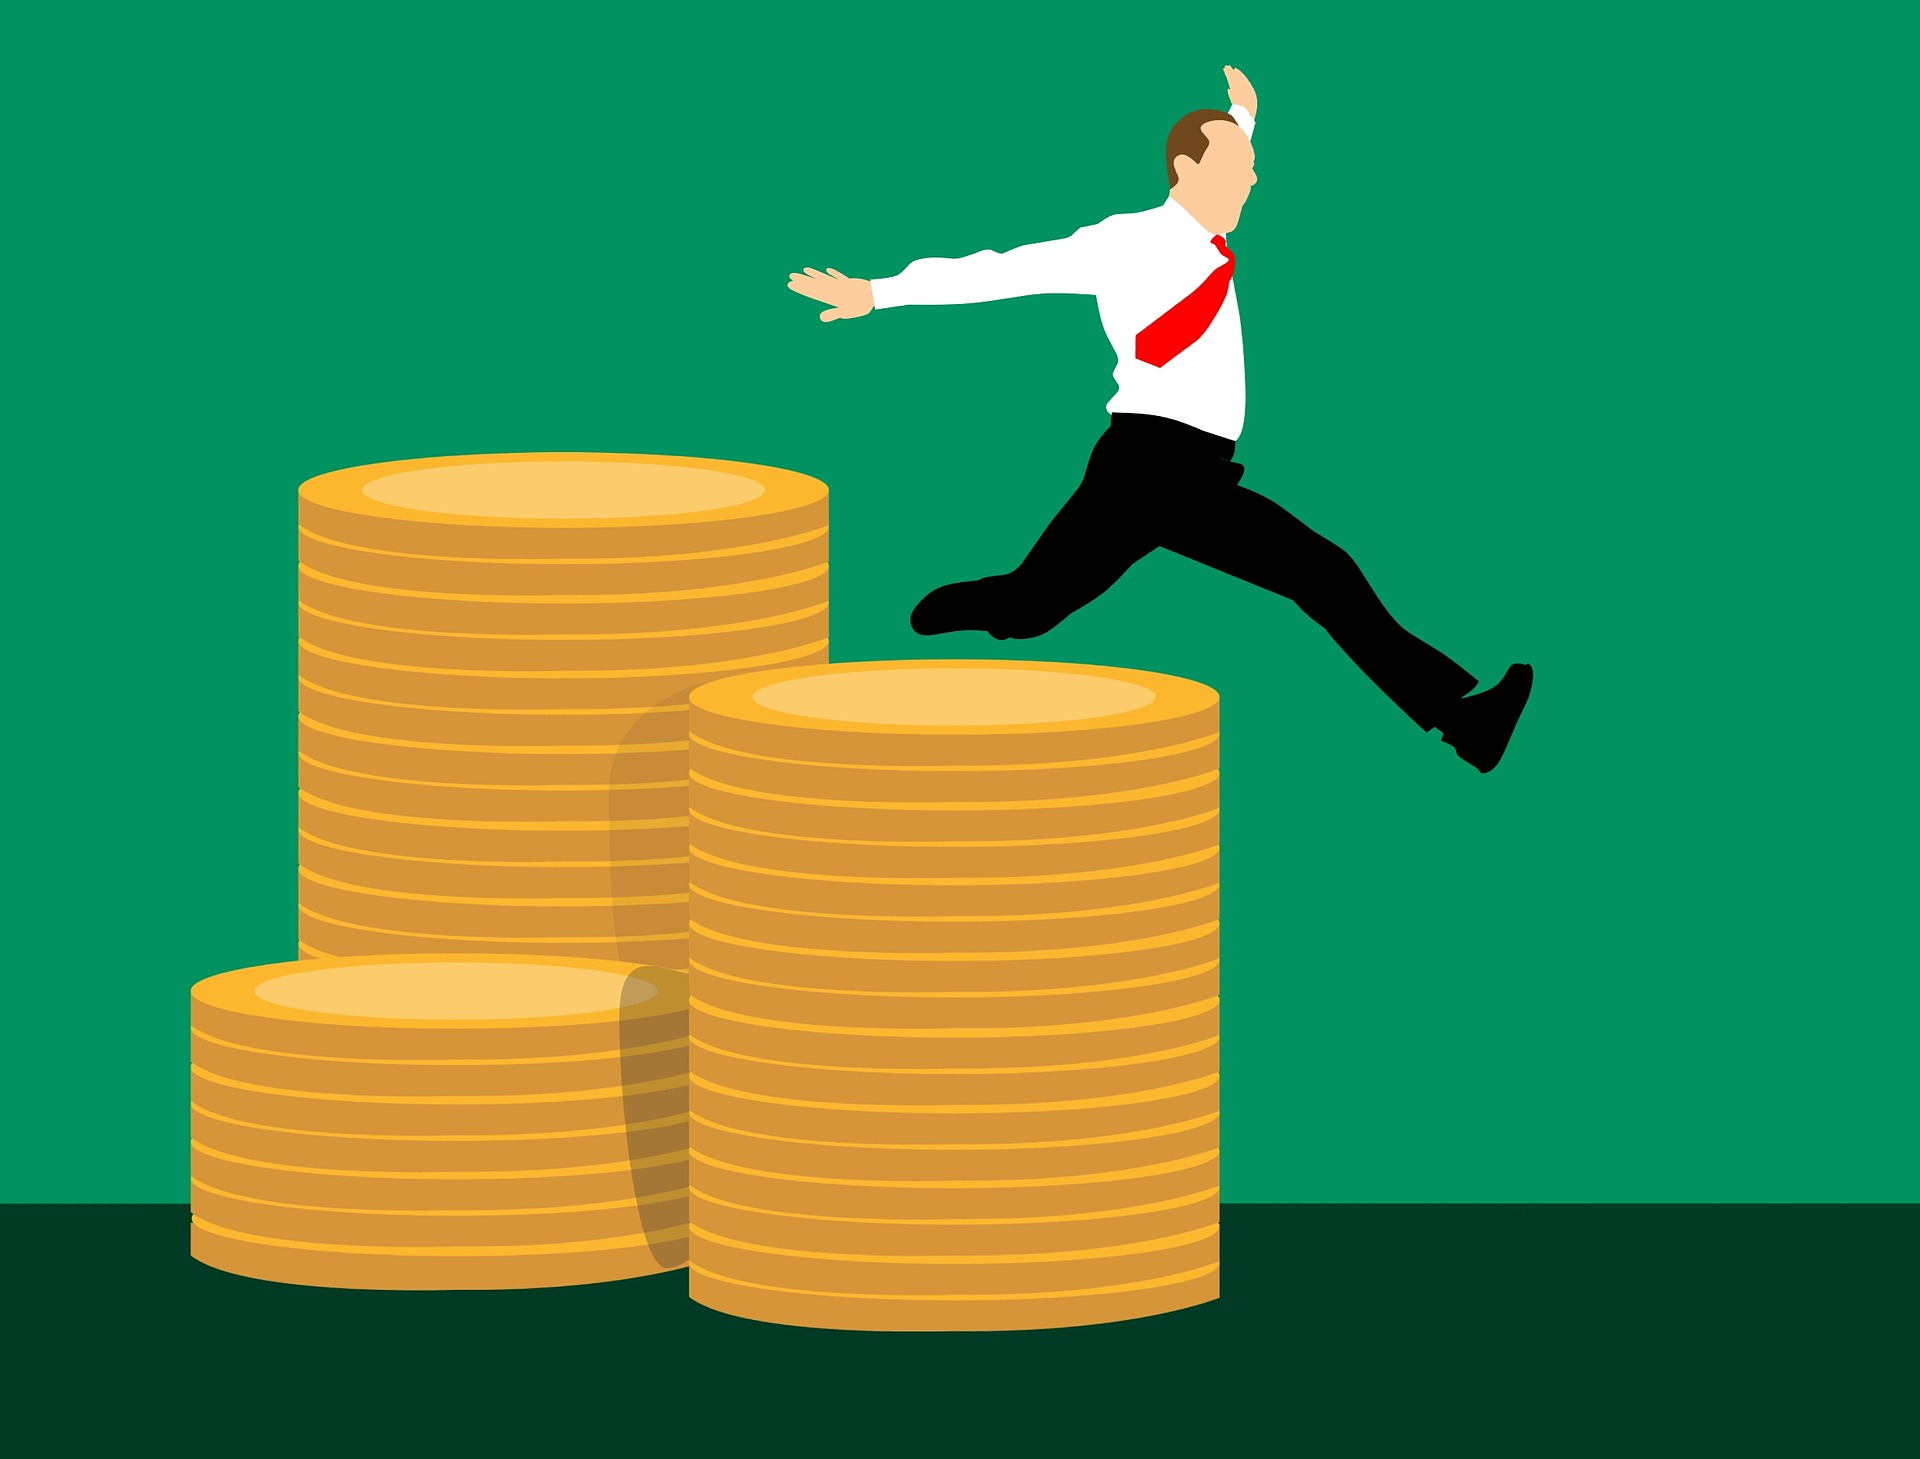 AB'den finansal sektör eylem planı